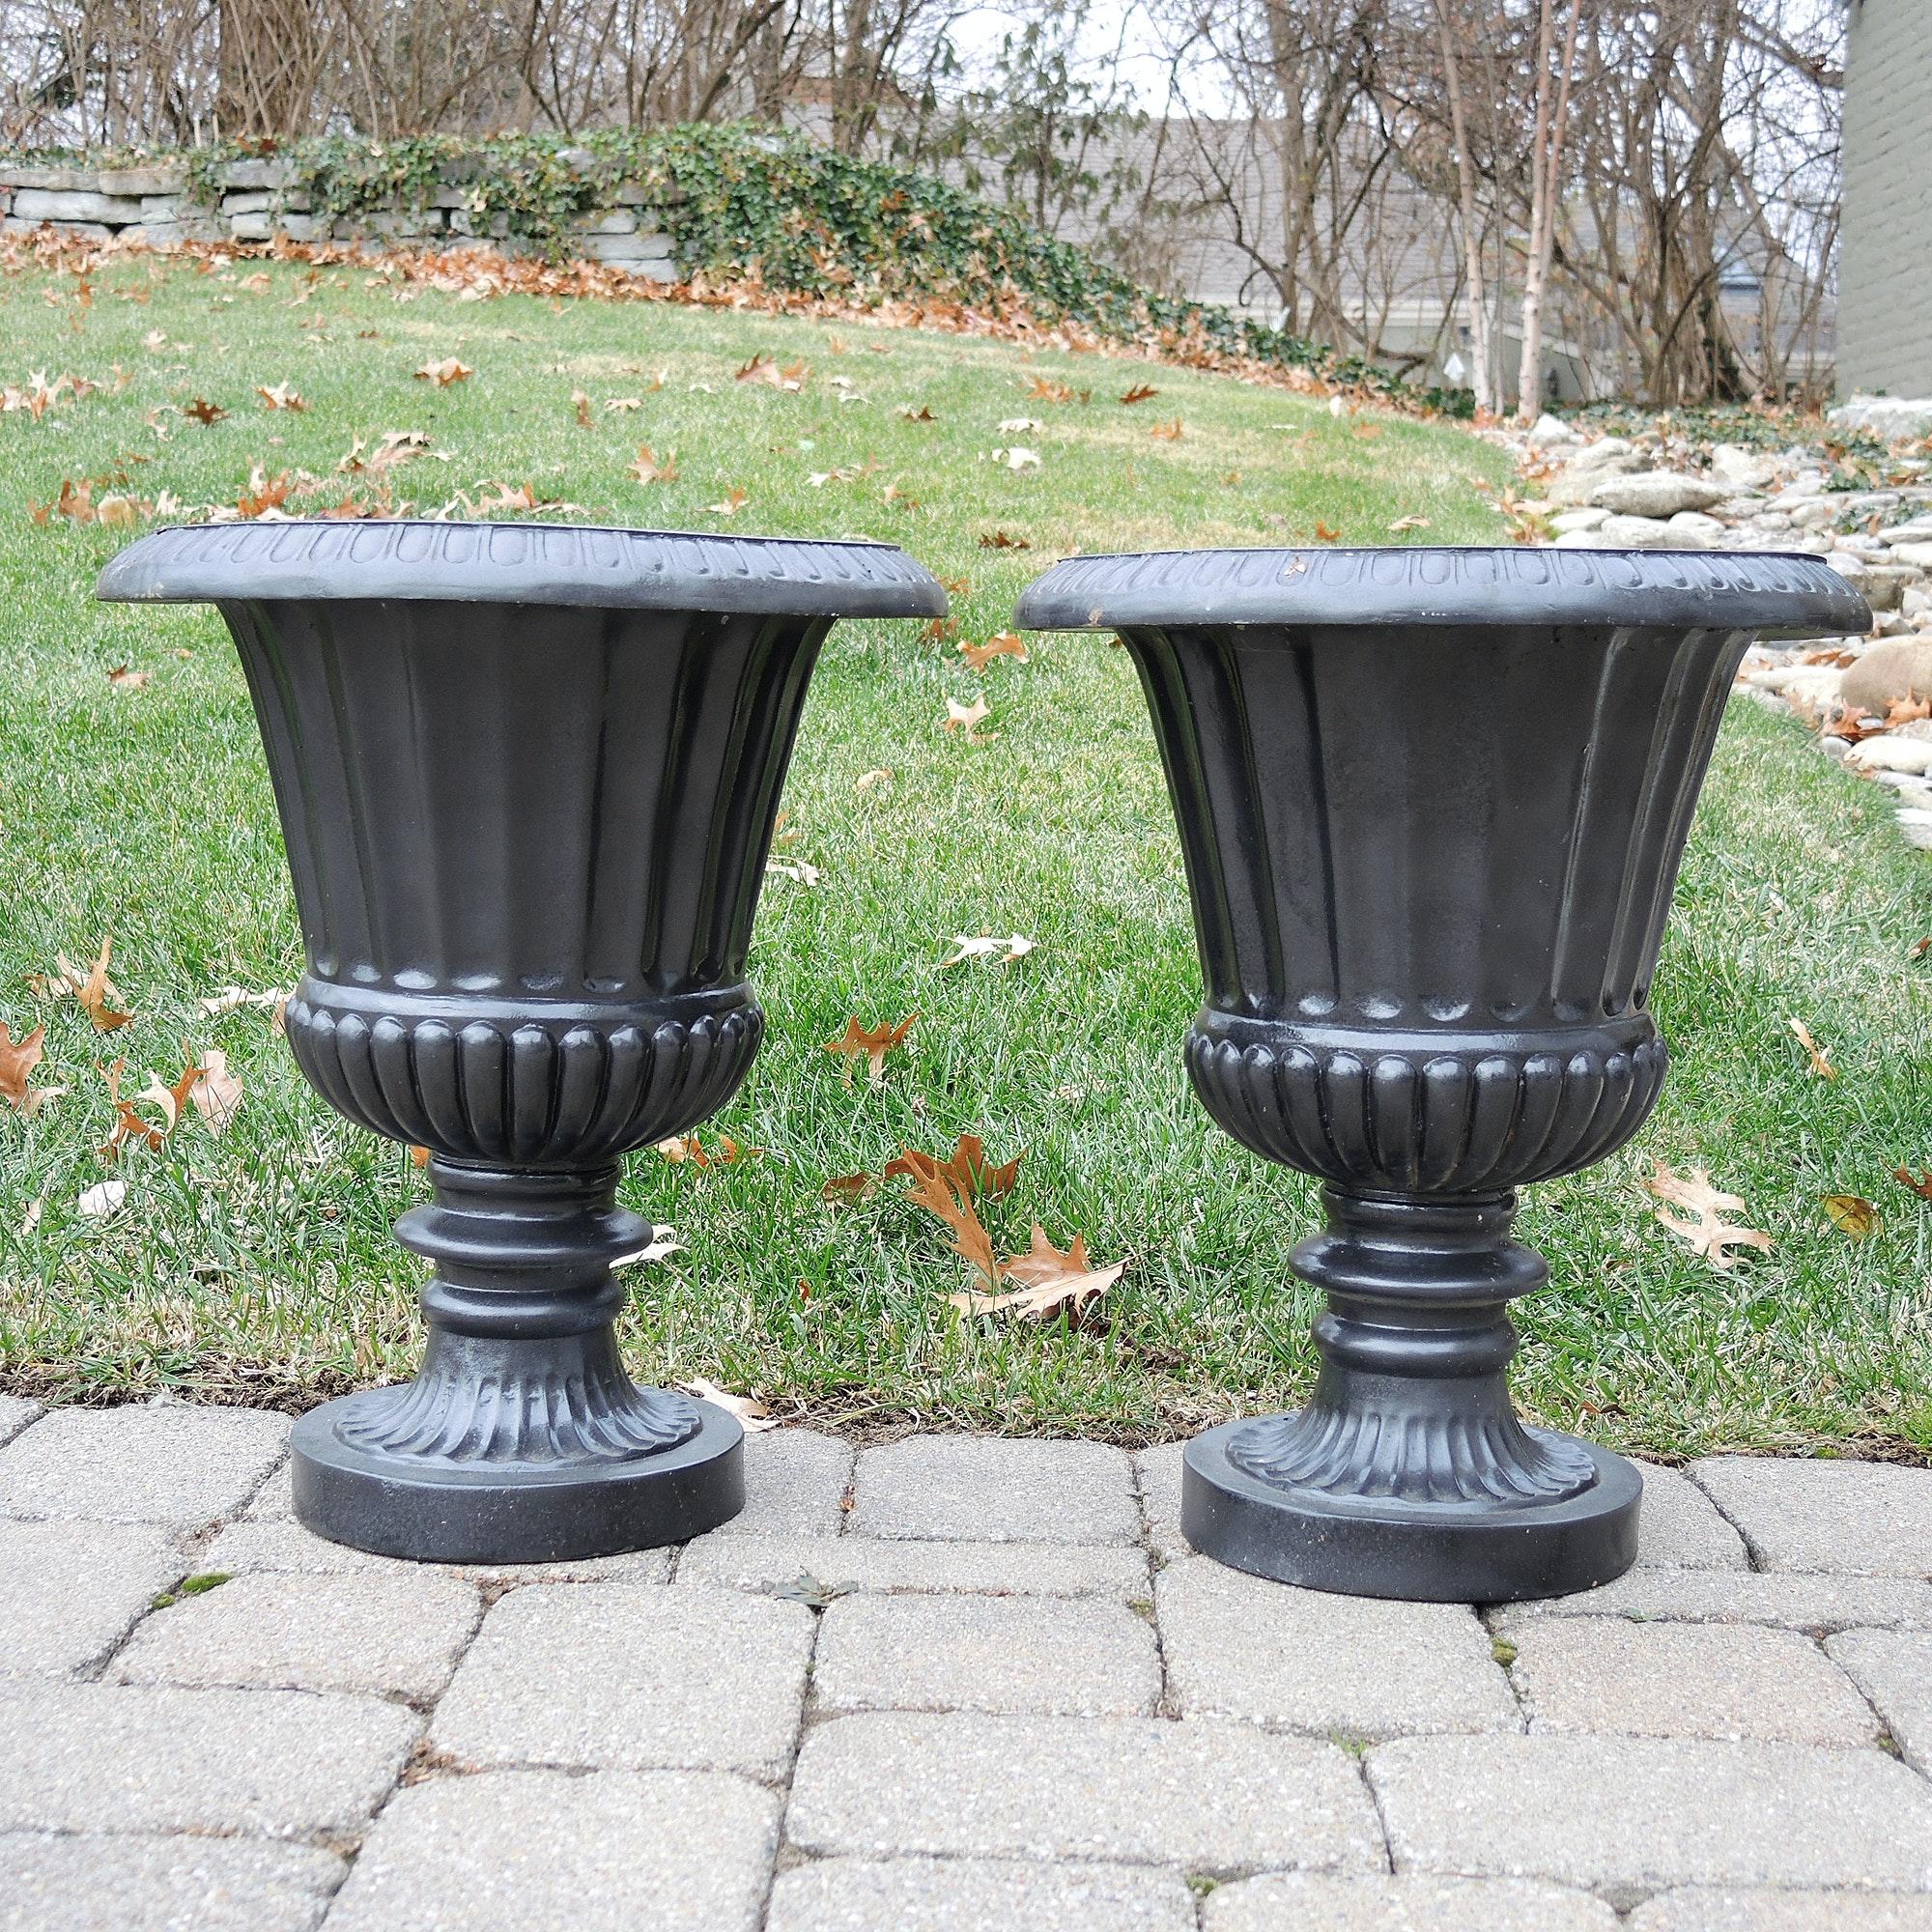 Fiberglass Decorative Garden Urn Planters